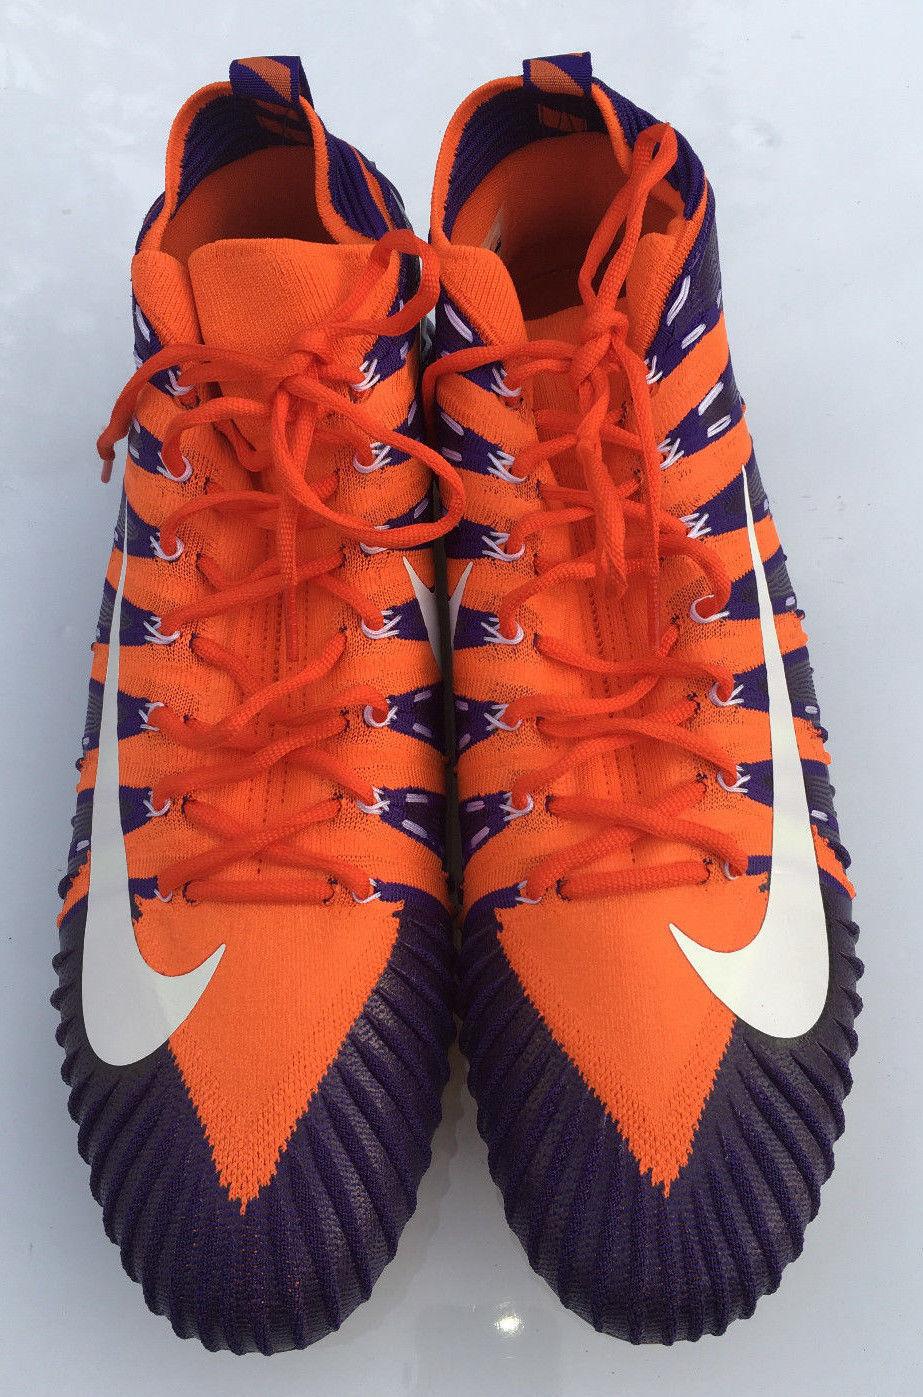 the latest d8329 2ce34 57. 57. Previous. Nike Alpha Menace Elite Football Cleats Tigers Orange size  13 16 877141-815. Nike Alpha ...